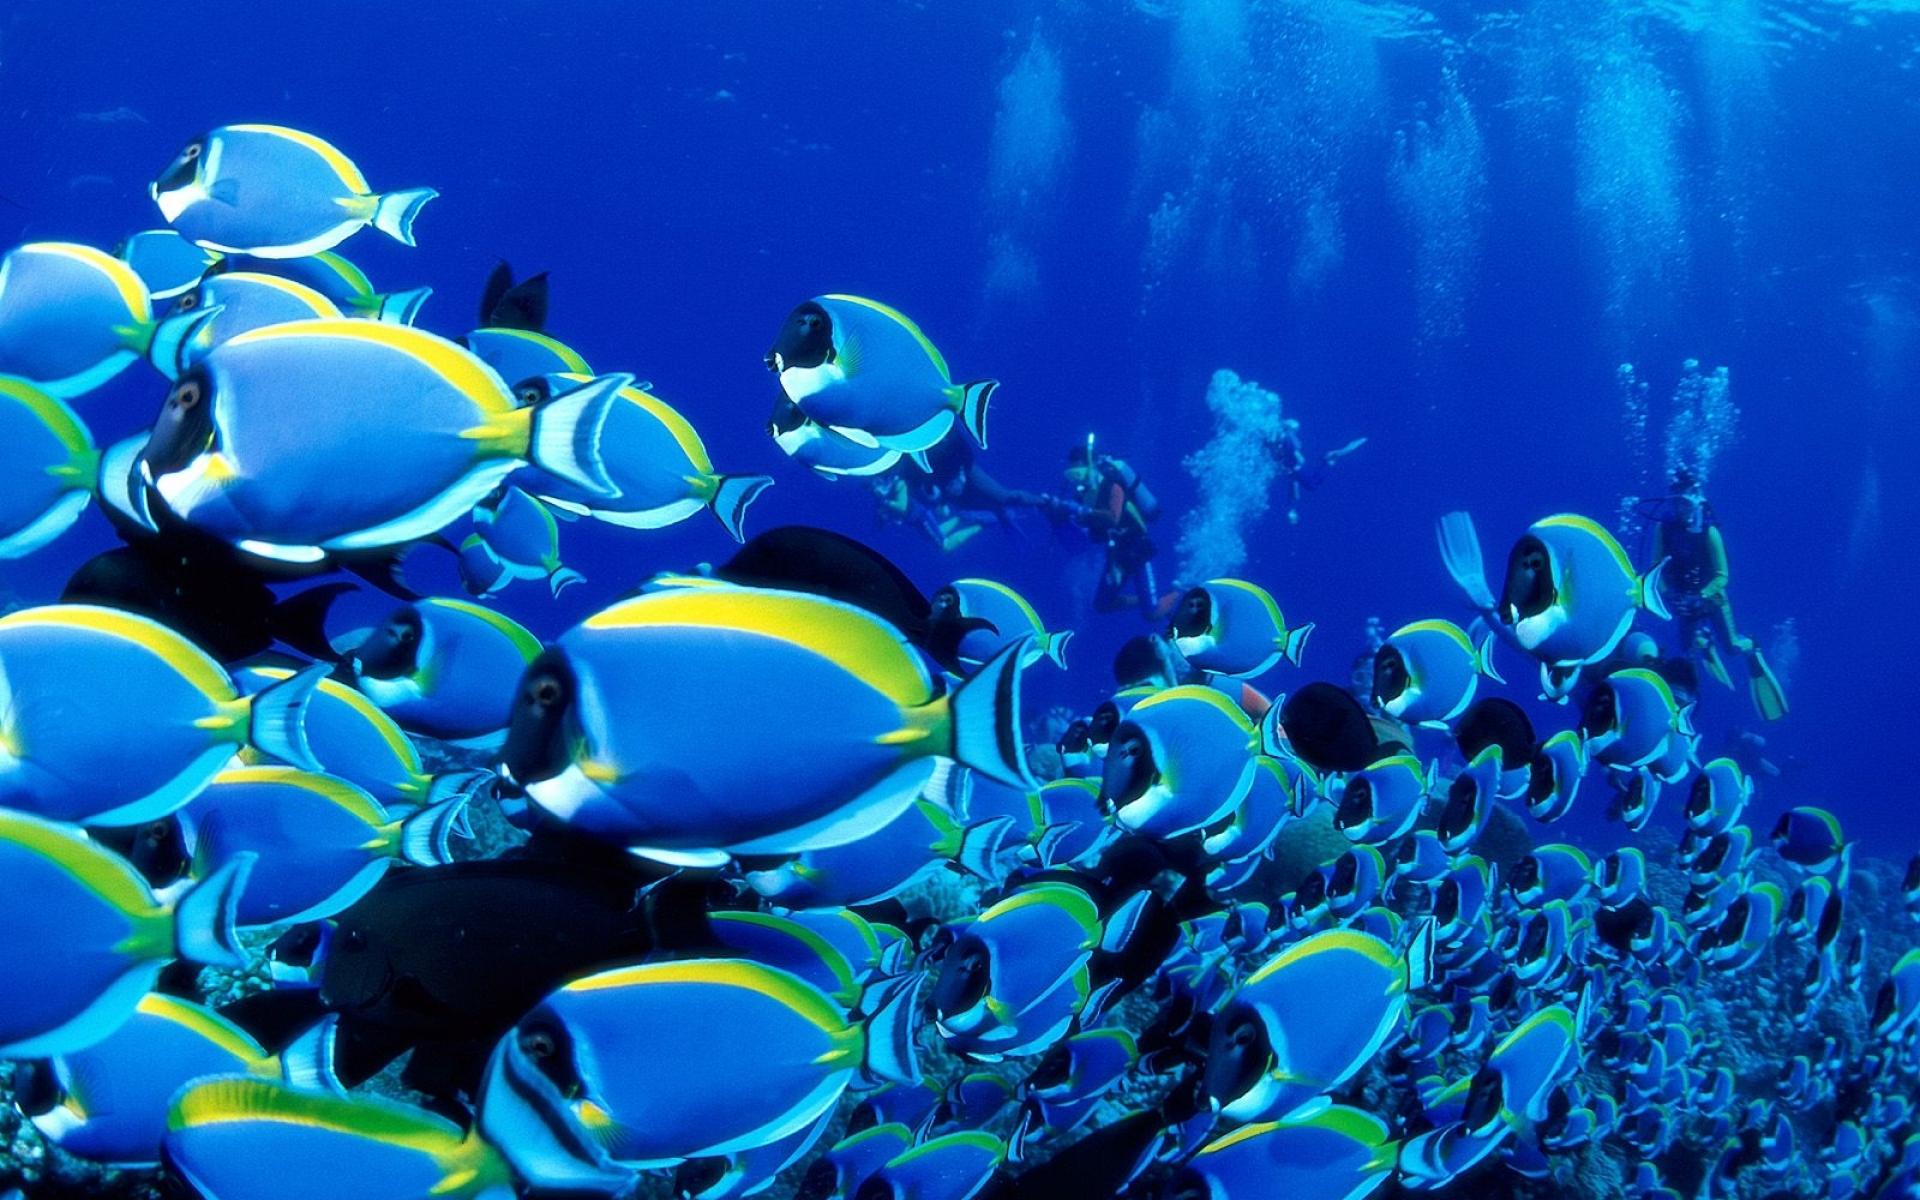 saltwater fish powder blue tang fish 1600x1200 wallpaper Wallpaper 1920x1200